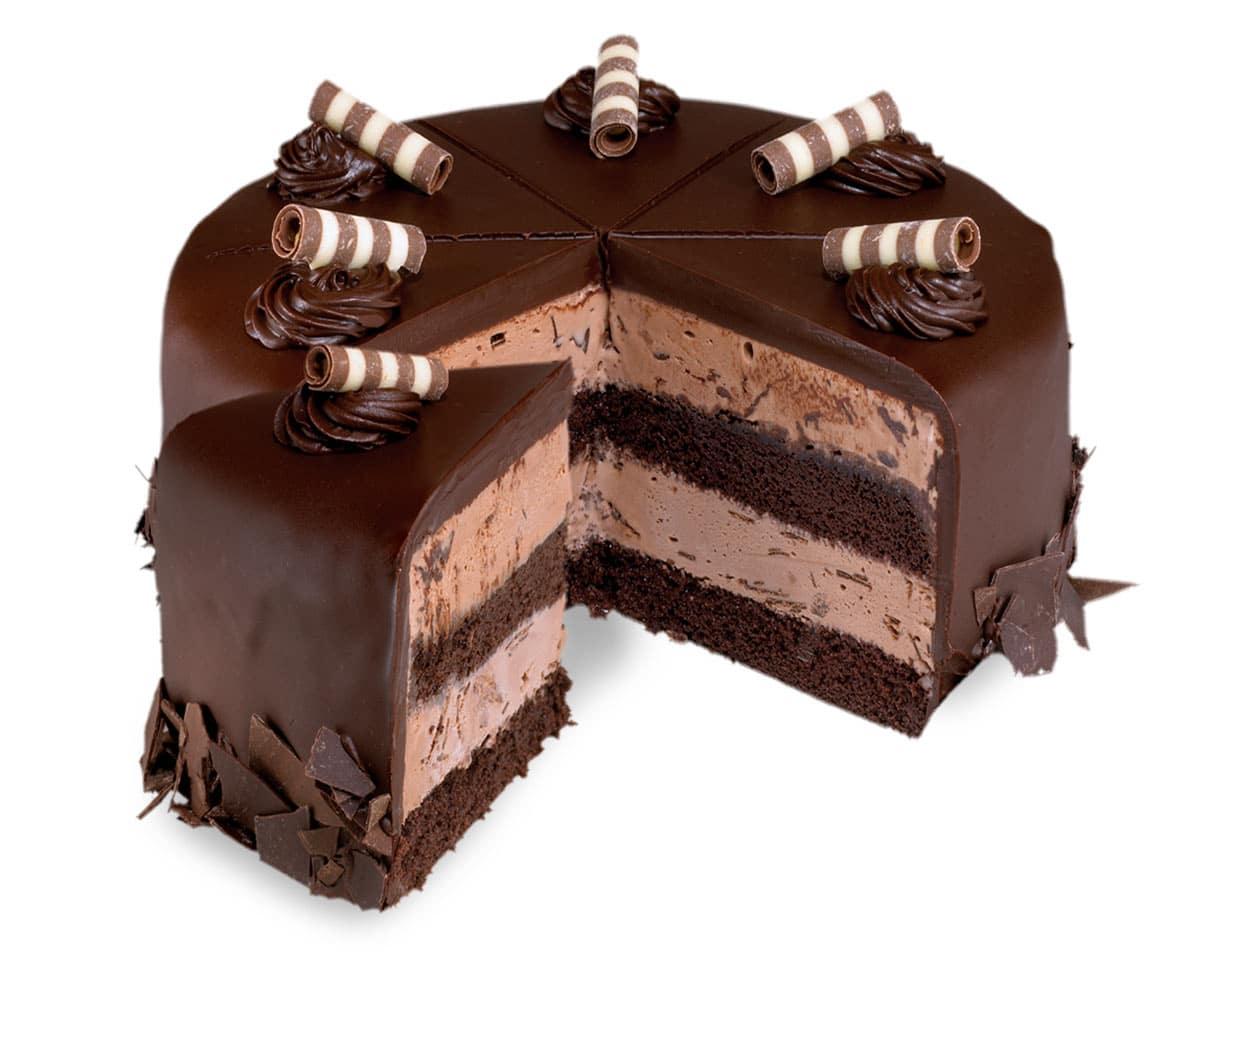 How Many Calories In Slice Of Ice Crea Cake